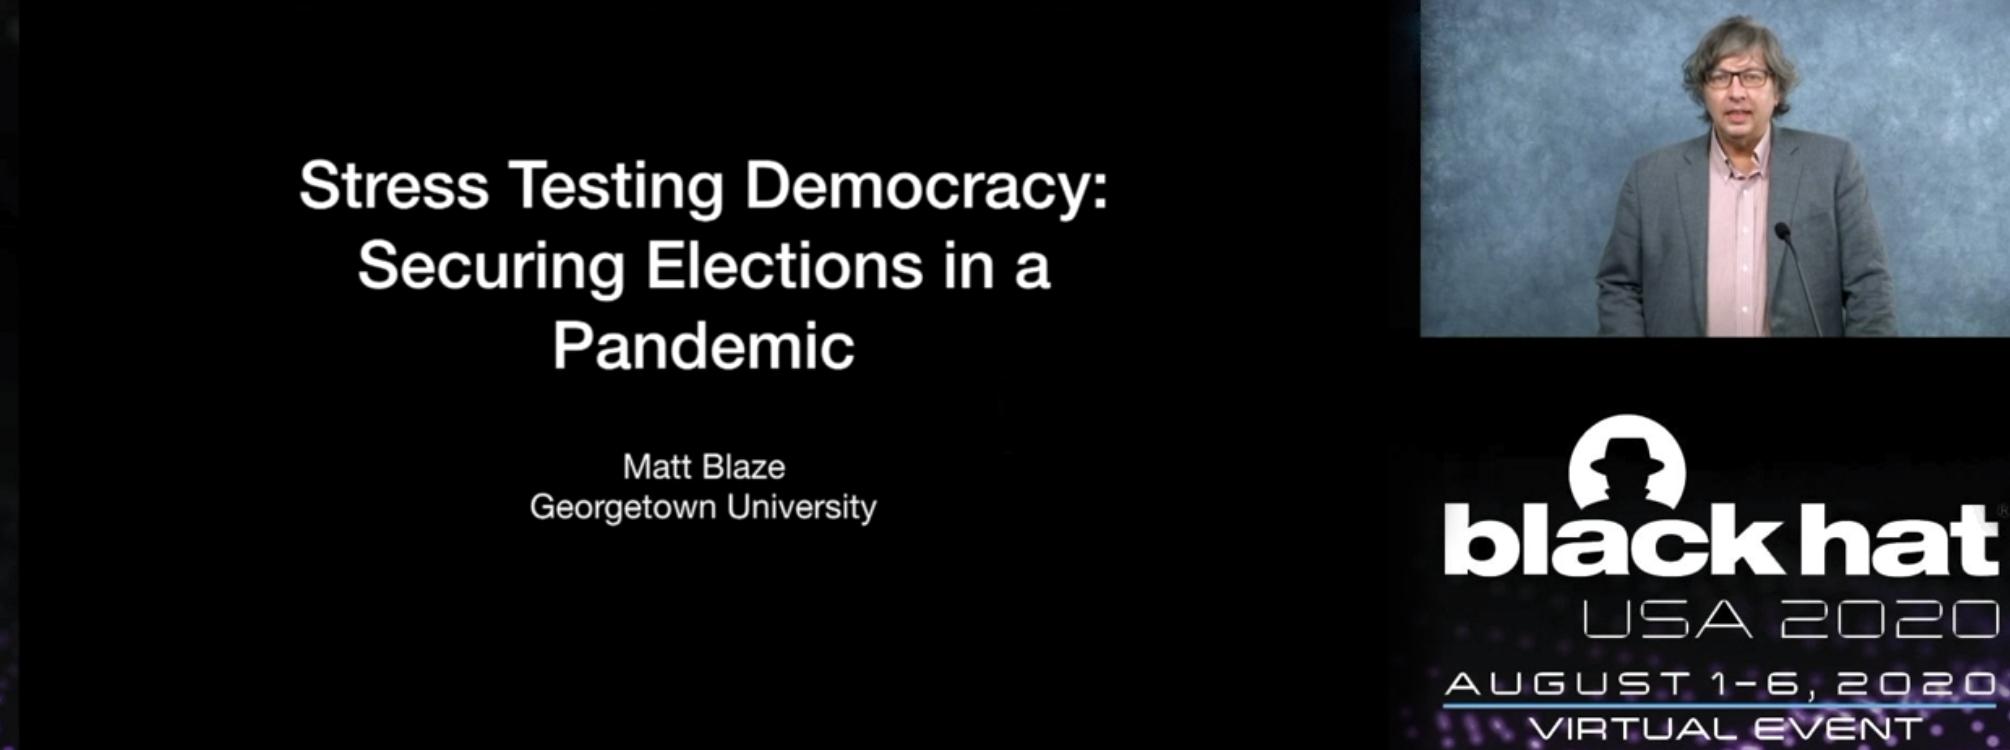 Stress Testing Democracy at Black Hat 2020